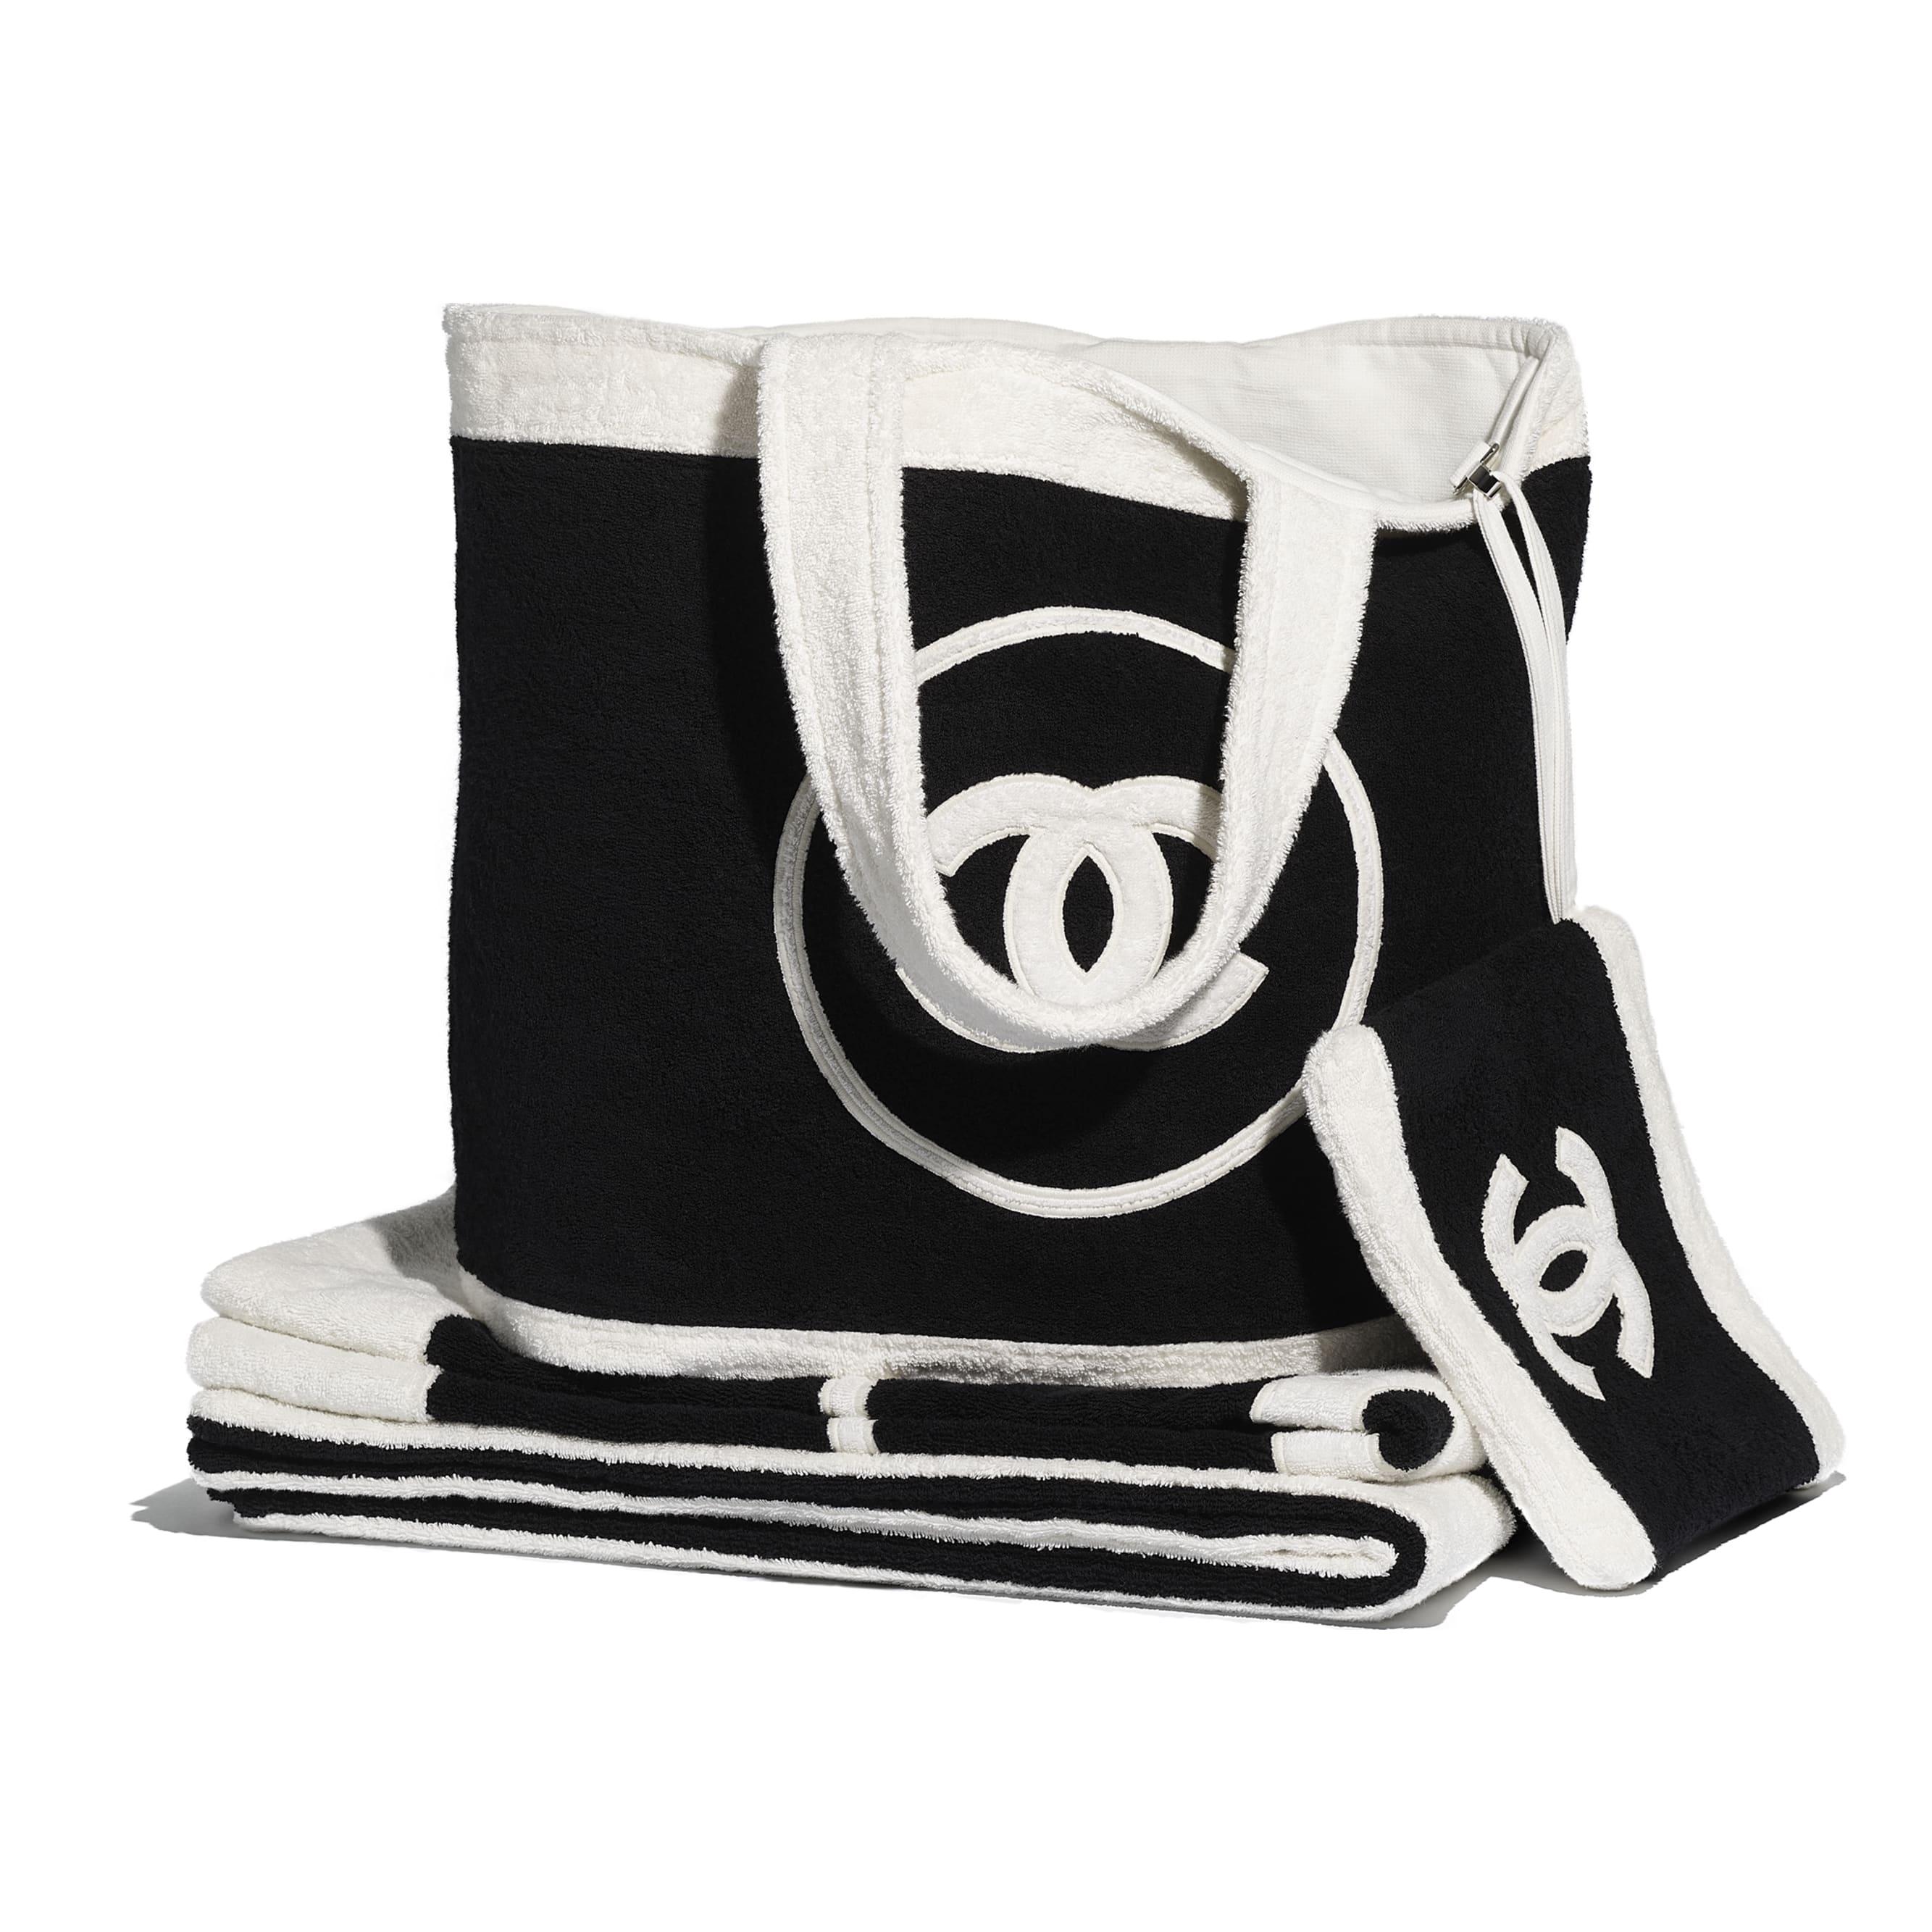 Beachwear Set - Black & White - Cotton - CHANEL - Default view - see standard sized version